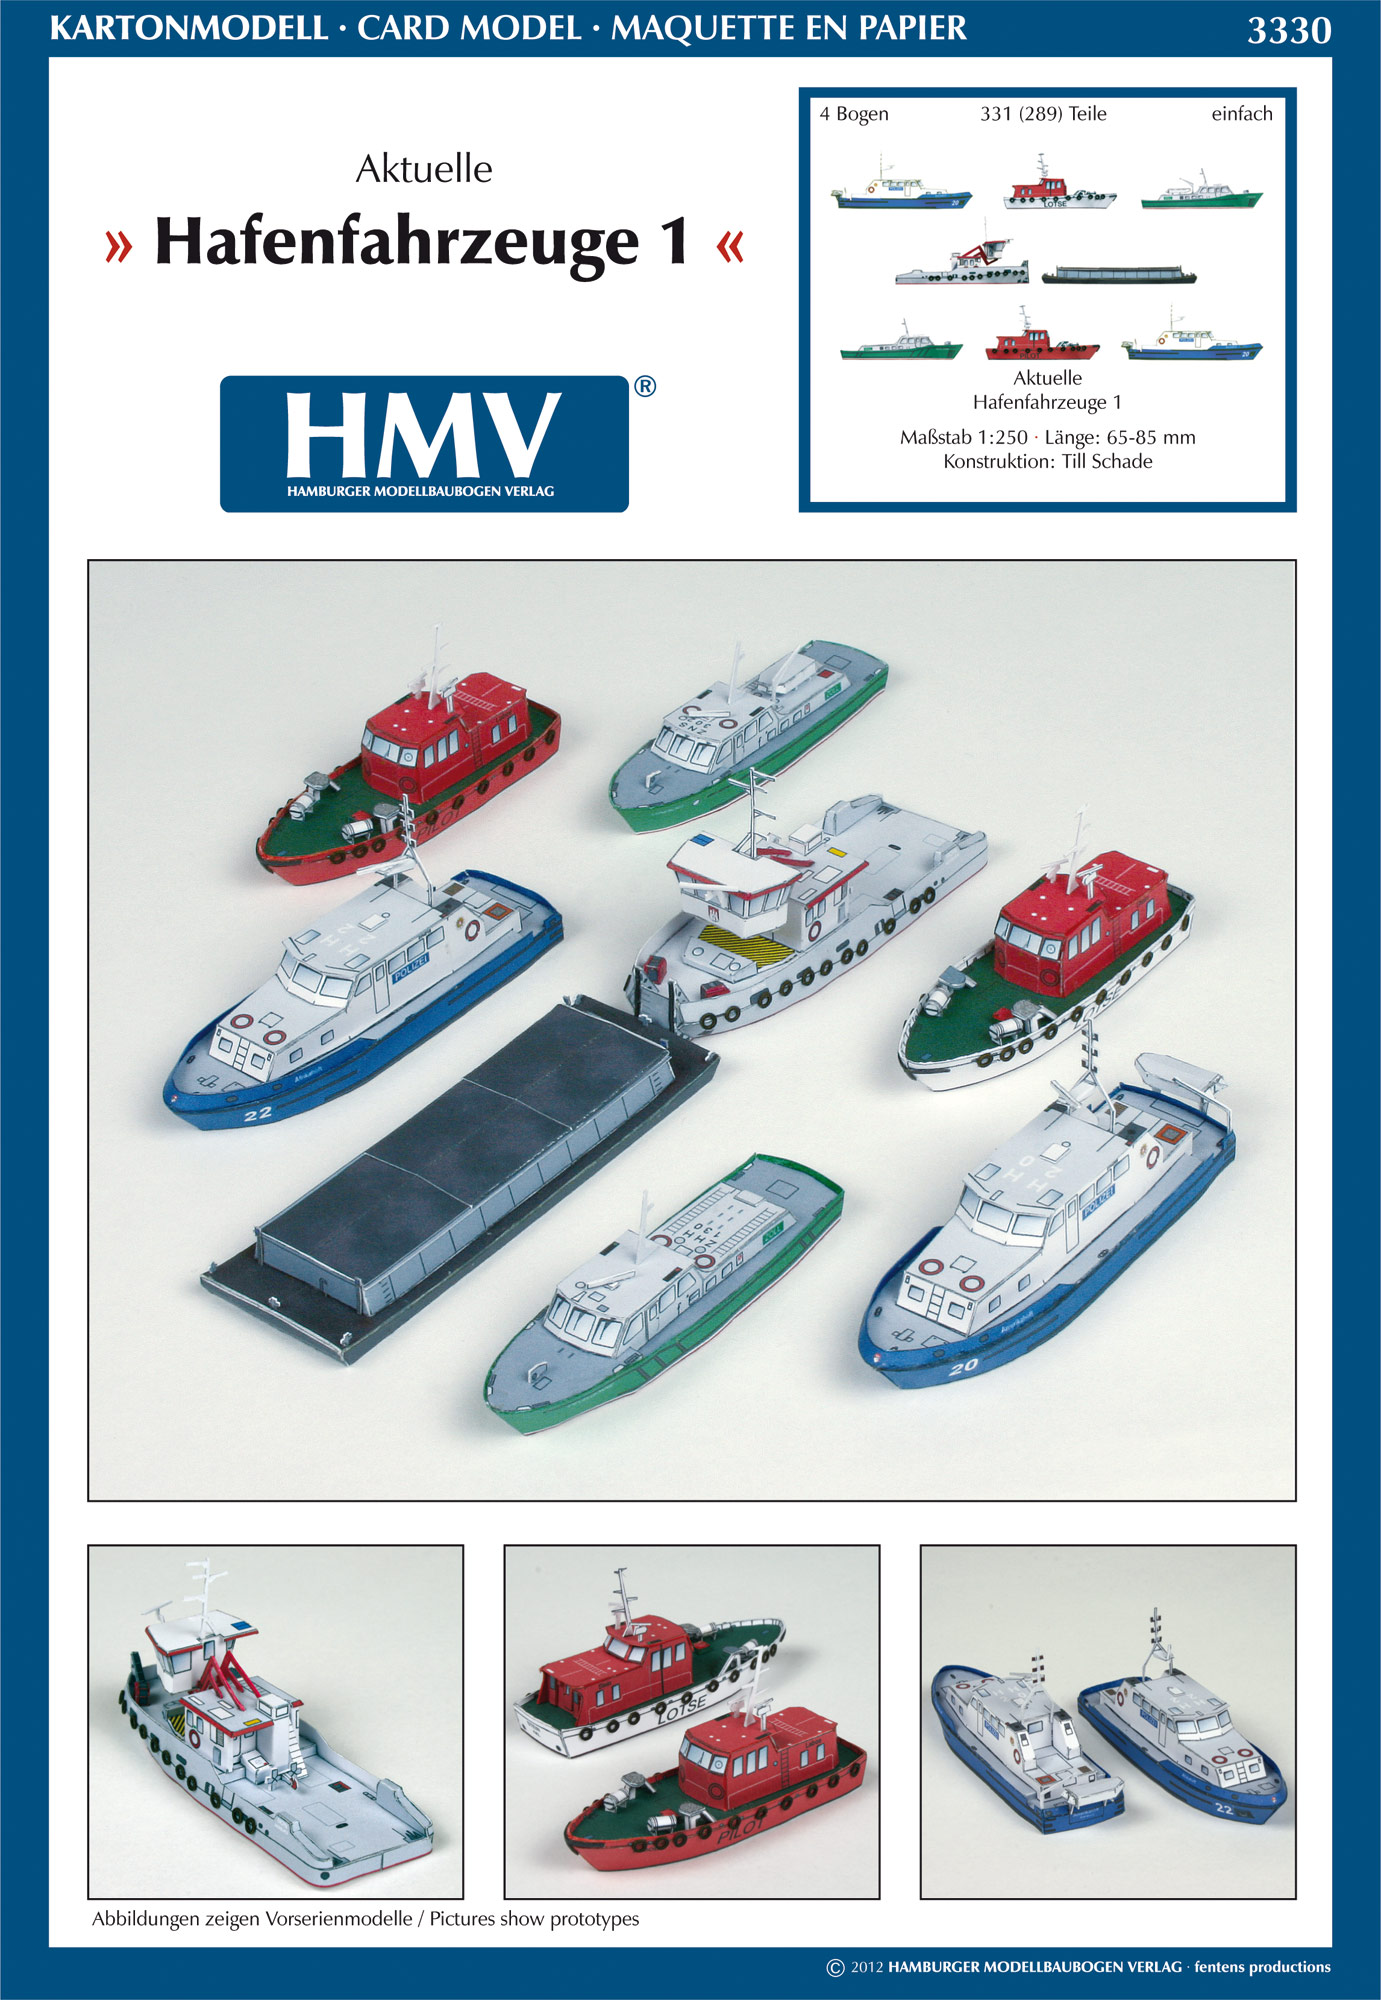 Modern Harbor Boats - HMV - Hamburger Modellbaubogen Verlag